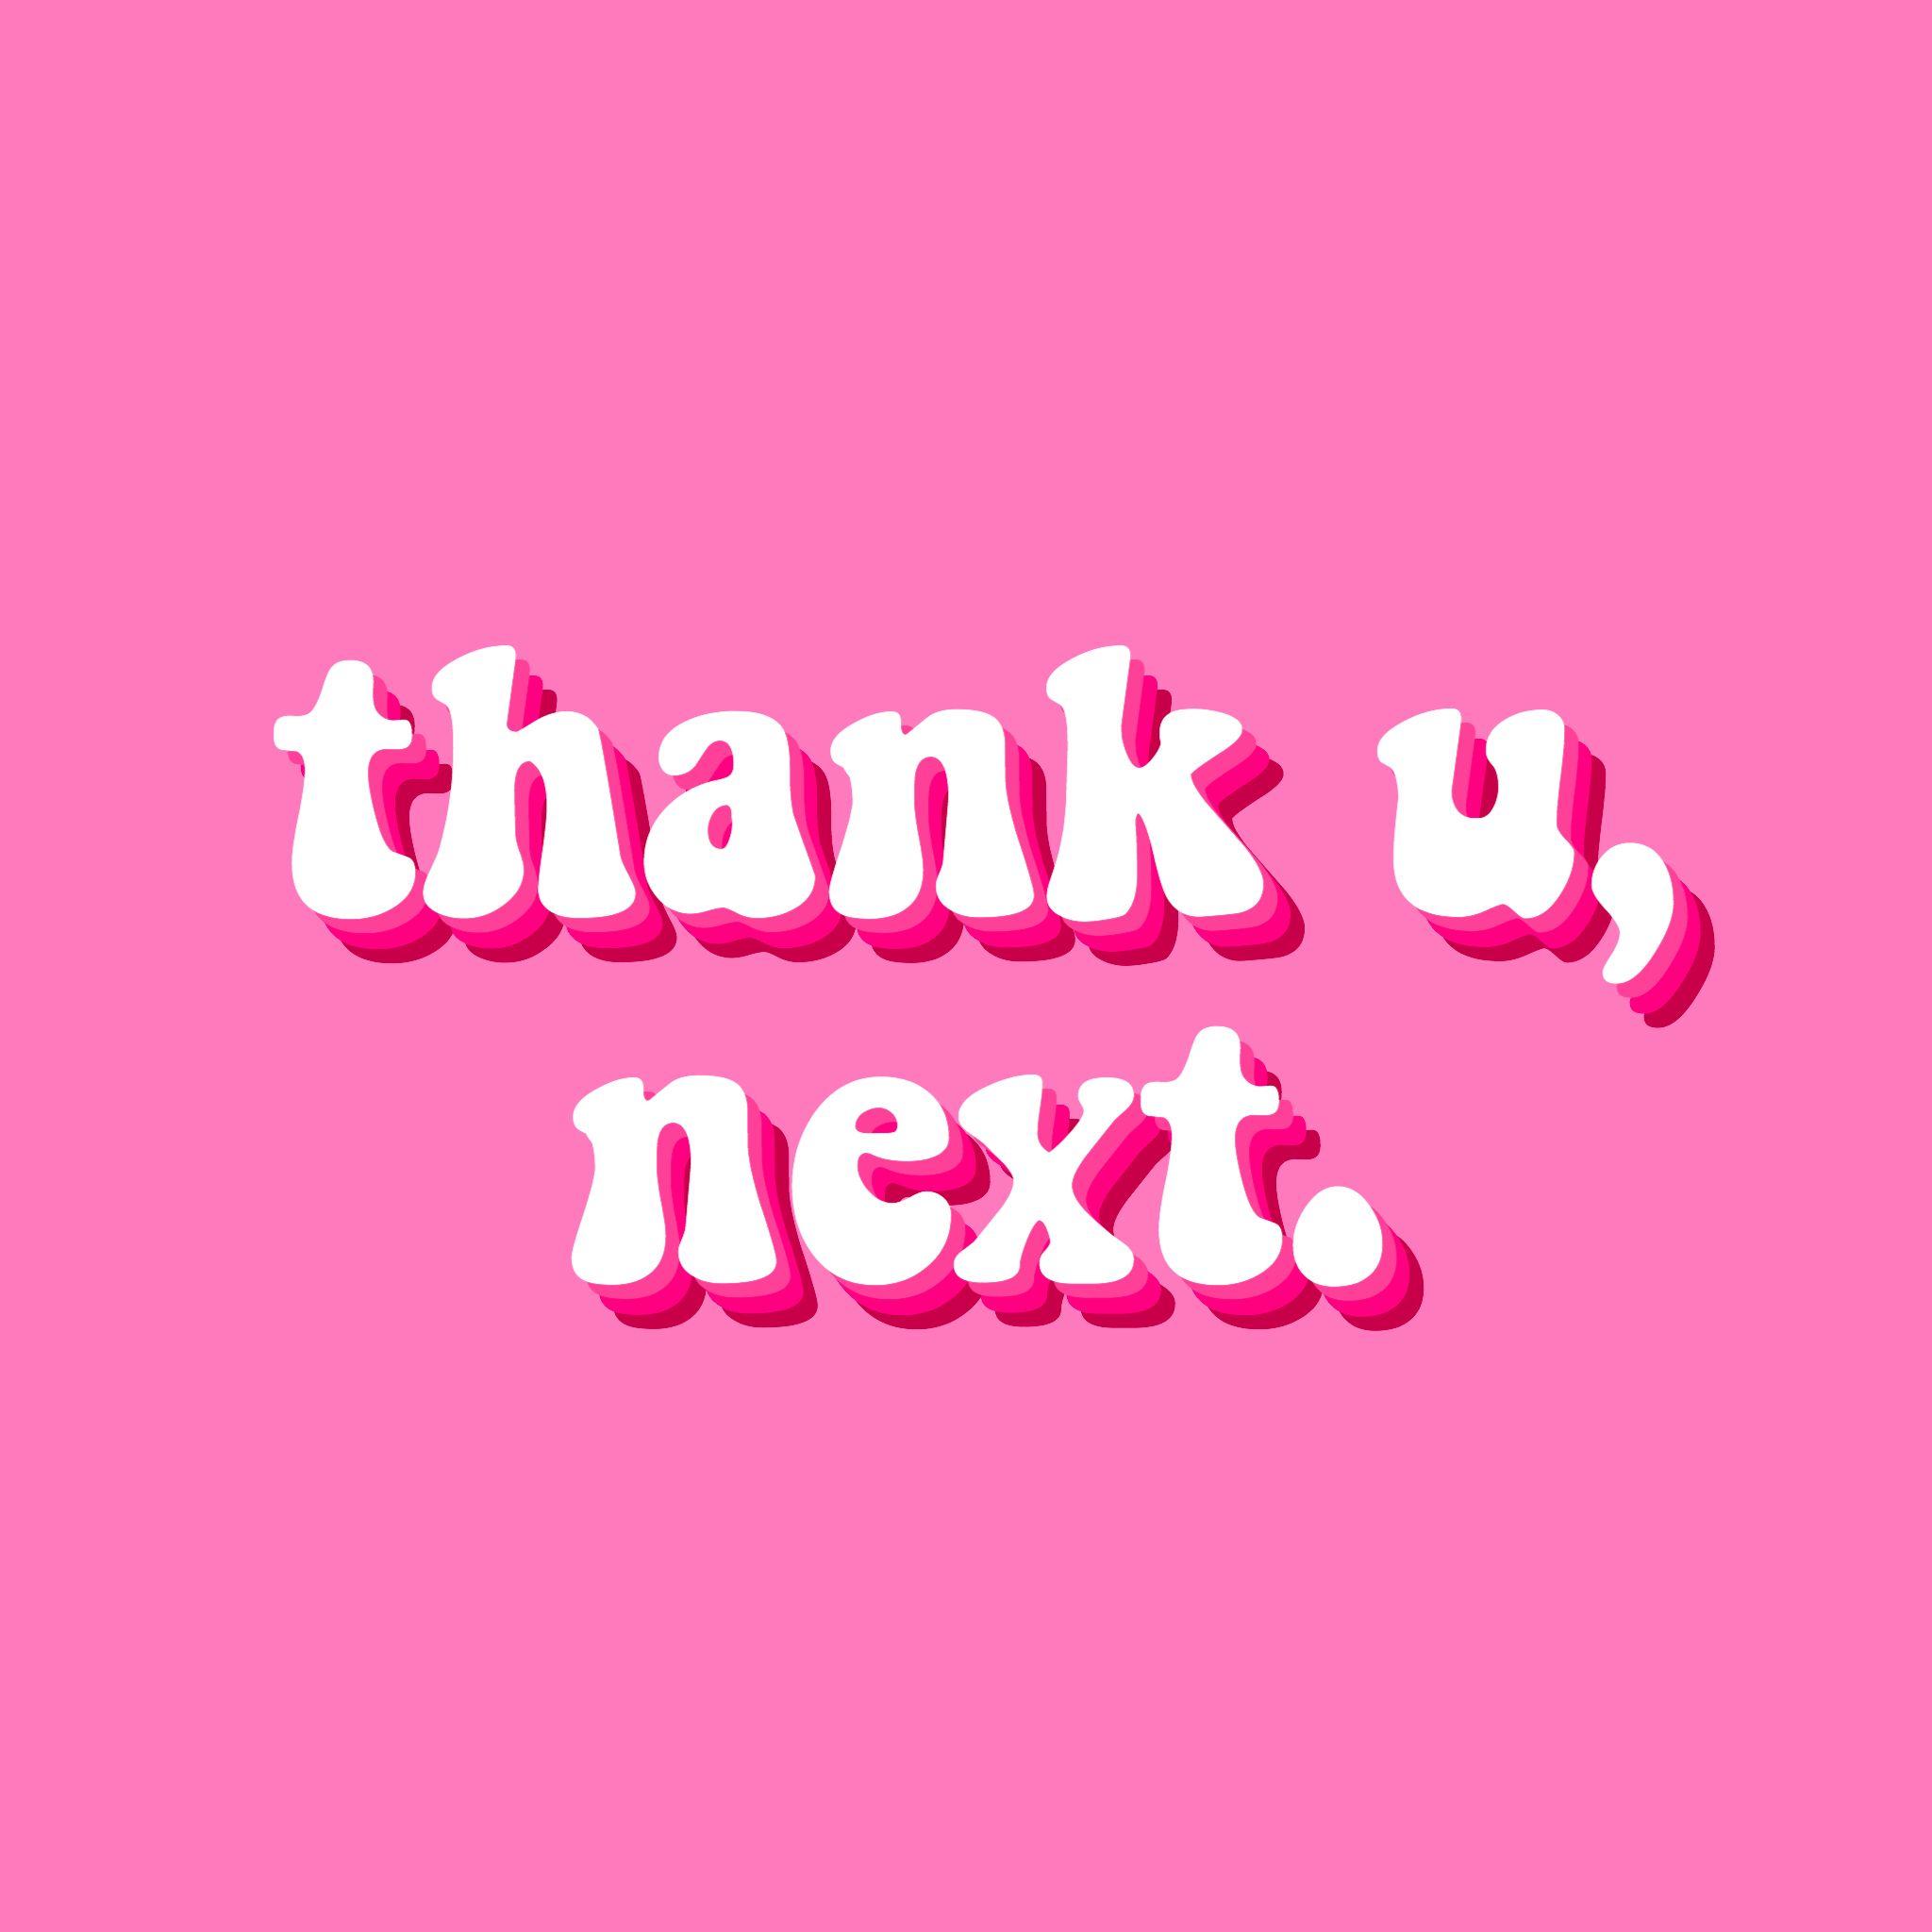 Download Lagu Thank U Arianda: Thank You Quotes Tumblr